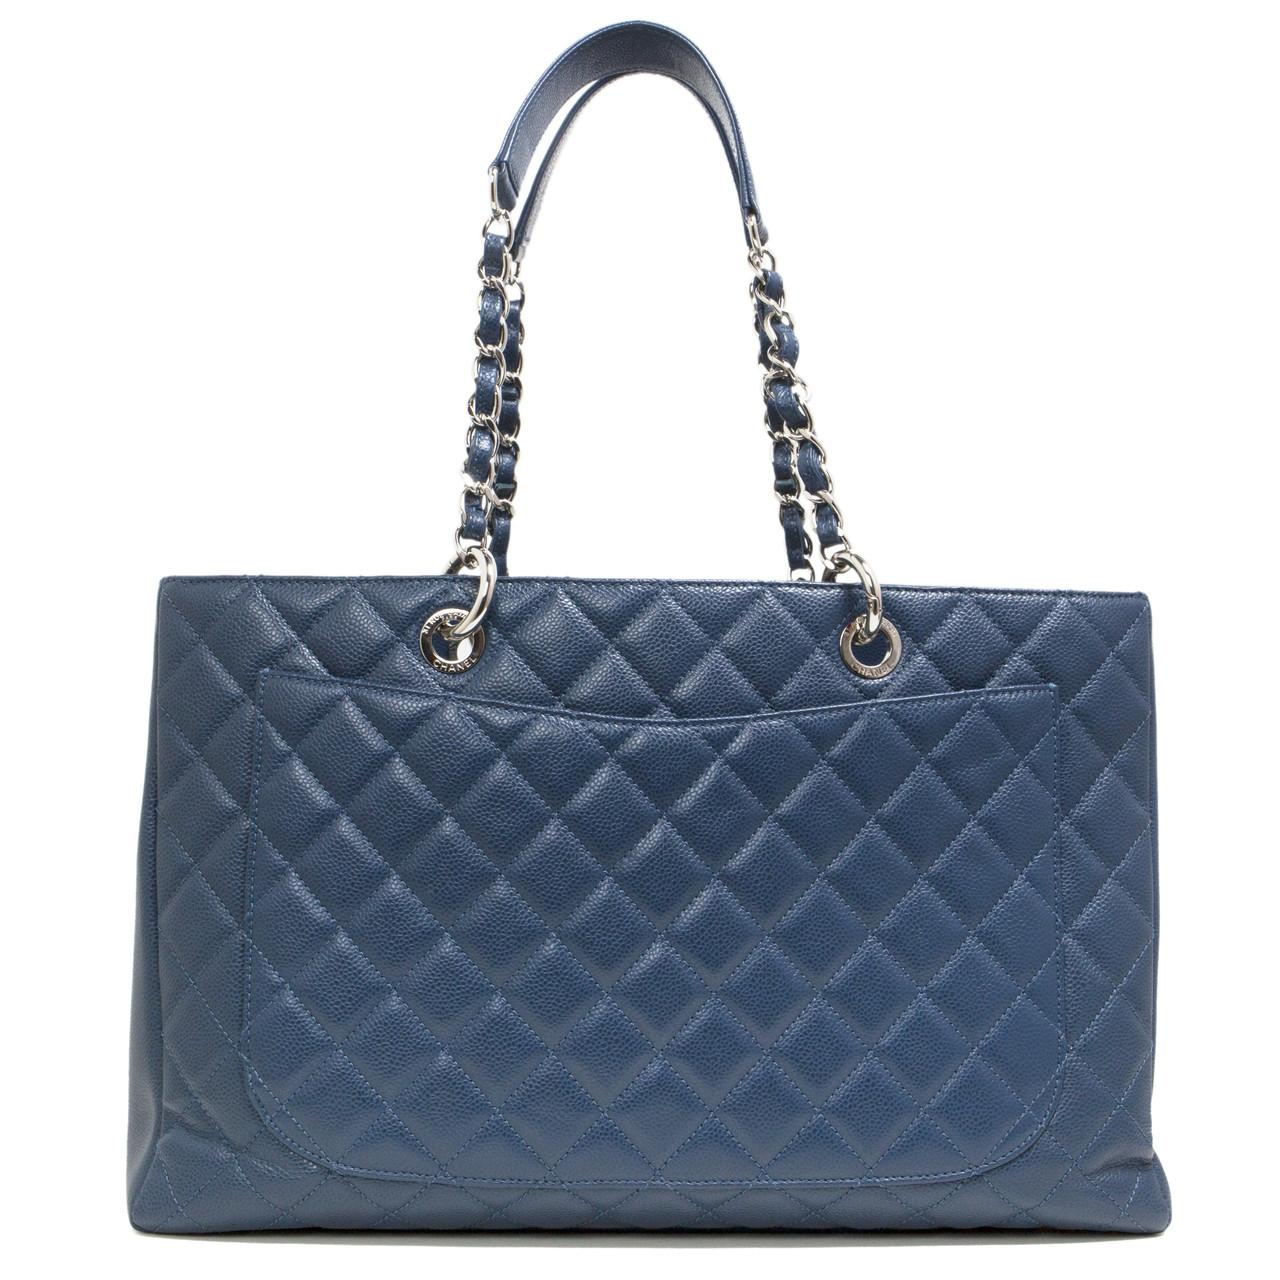 207ef125b7cc93 Chanel Blue Caviar XL Grand Shopping Tote GST - modaselle